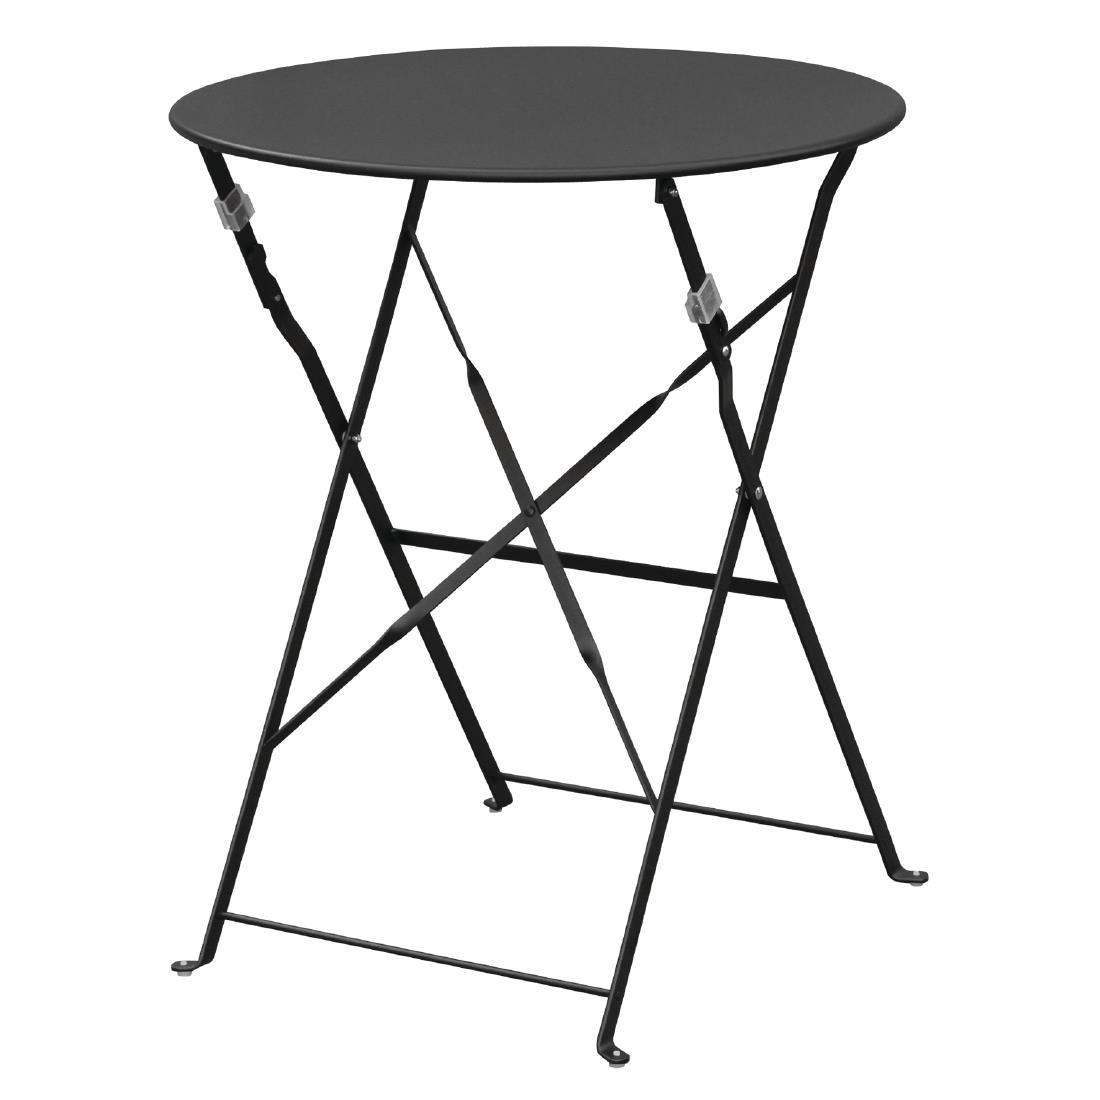 Steel Folding Table Round - Black